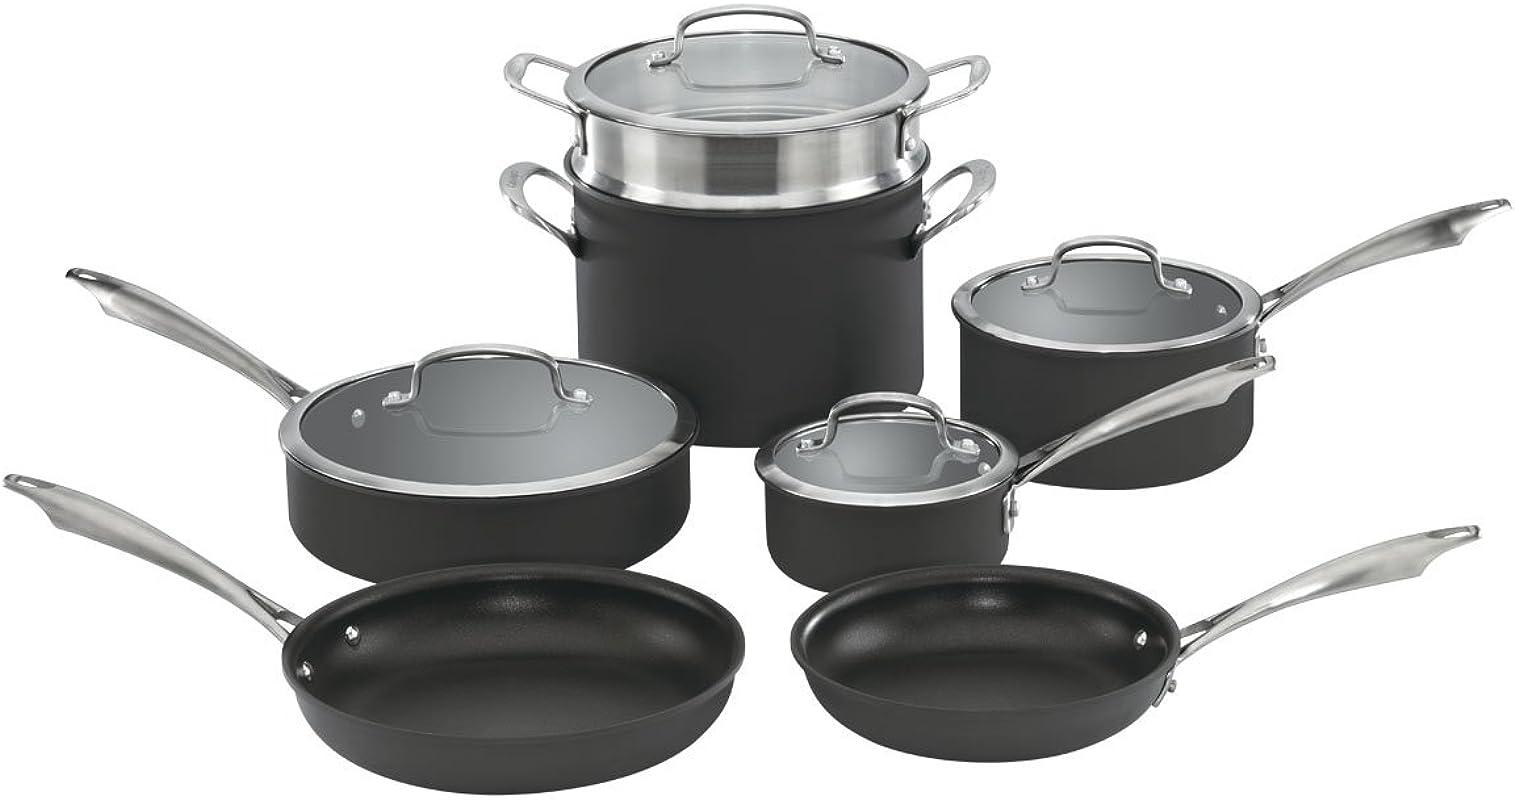 Cuisinart DSA 11 Dishwasher Safe Hard Anodized 11 Piece Cookware Set